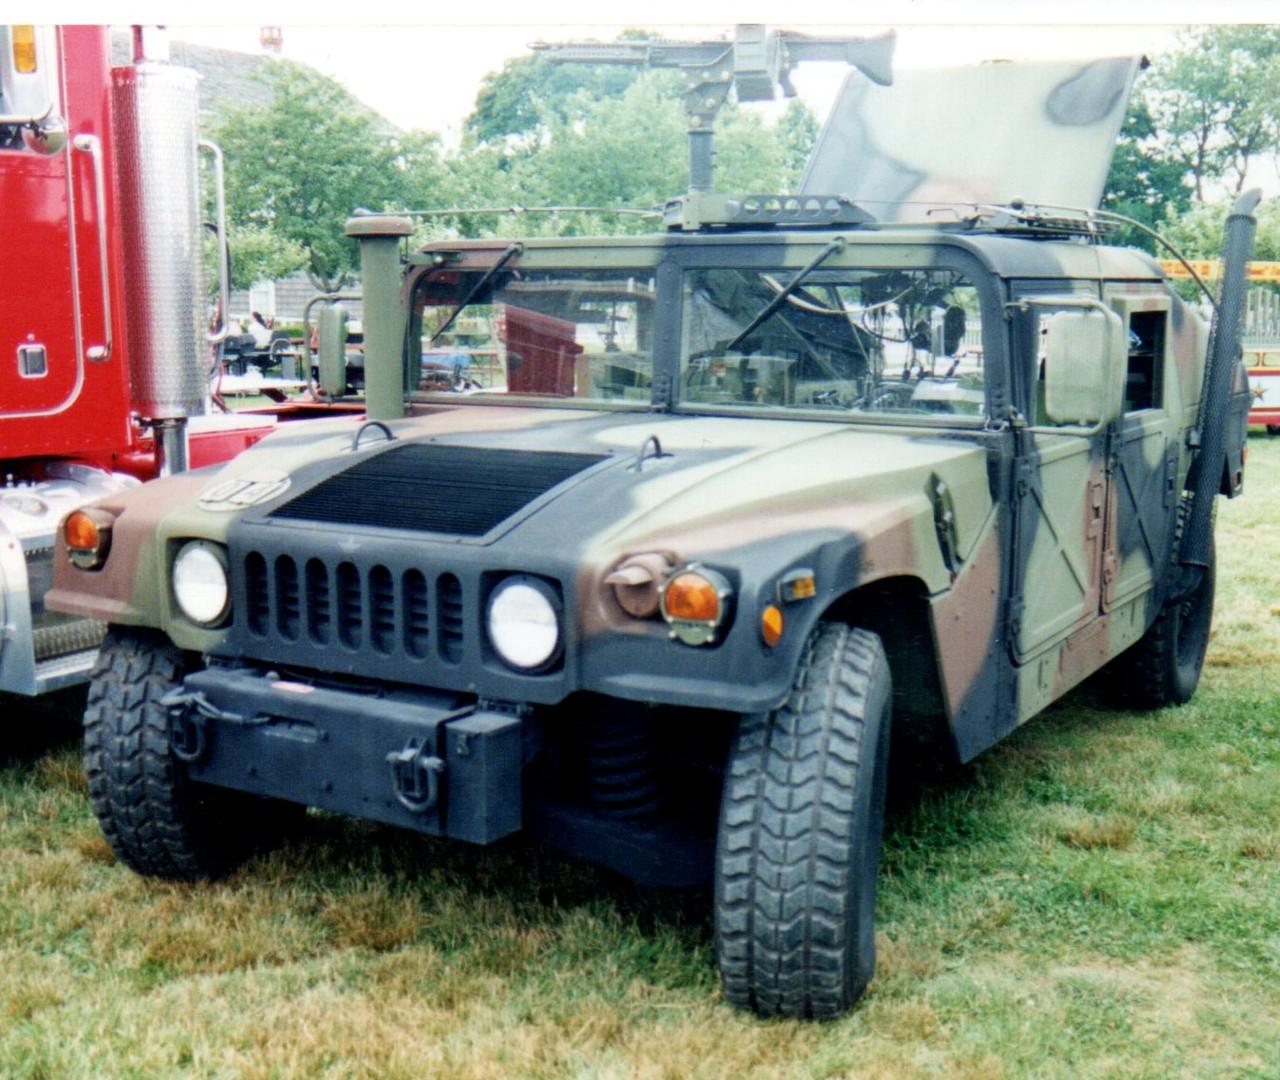 1980's AM General Humvee